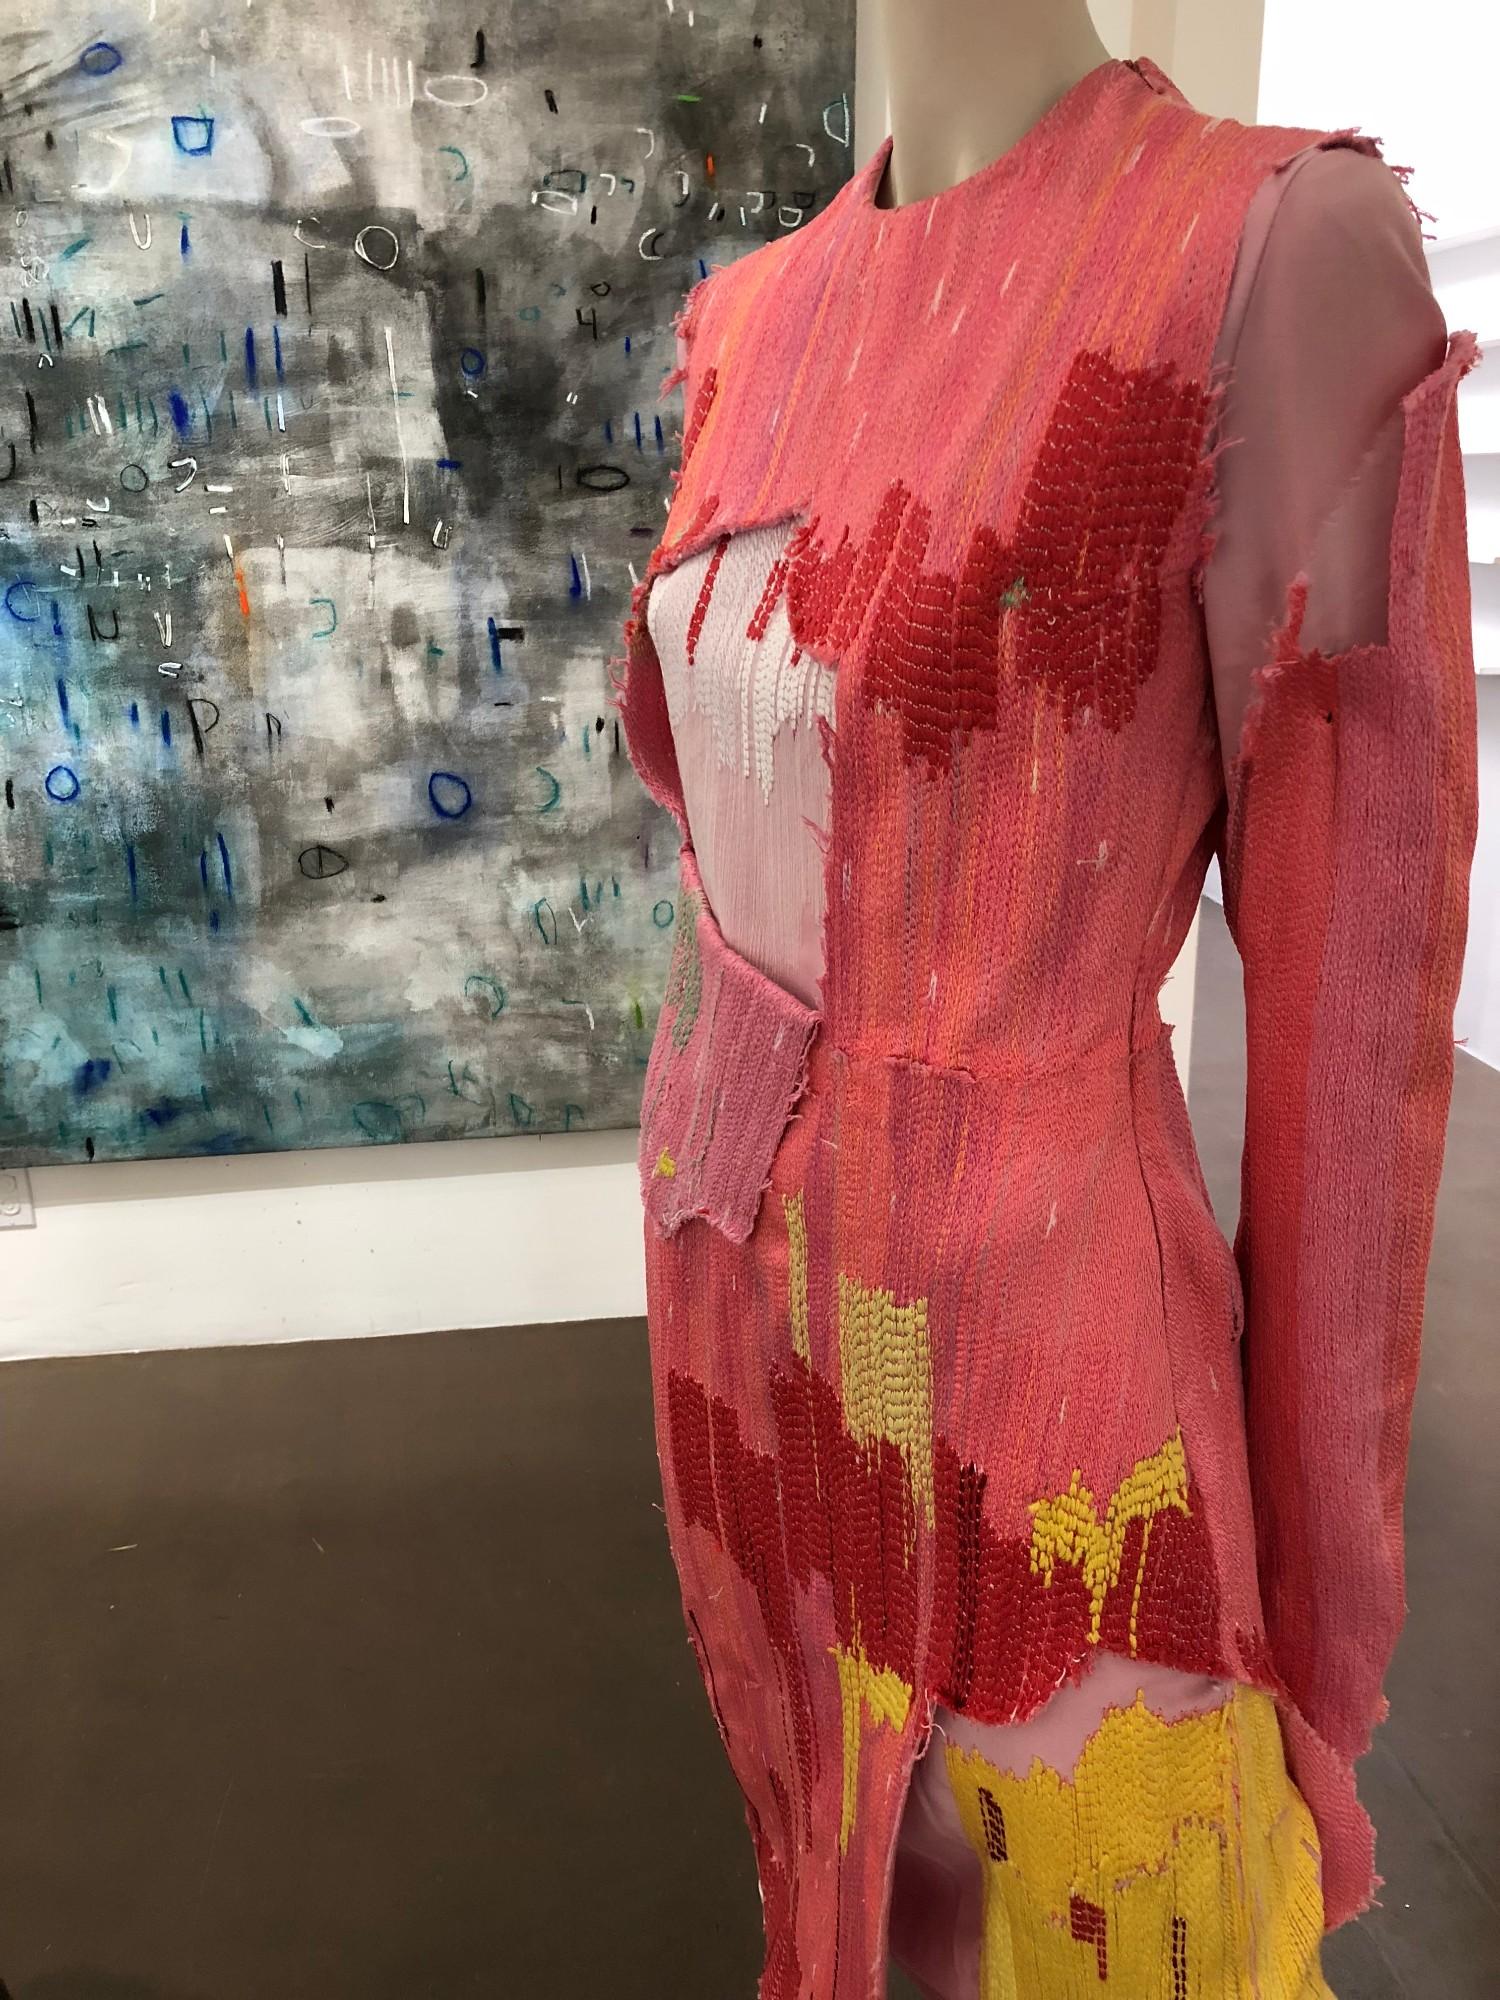 curated by Rhonda P. Hill, Blurred Boundaries Fashion as an Art exhibit, Tingyue Jiang, designer, Erik ReeL painting, GraySpace Gallery, Santa Barbara, photo Charlene Broudy